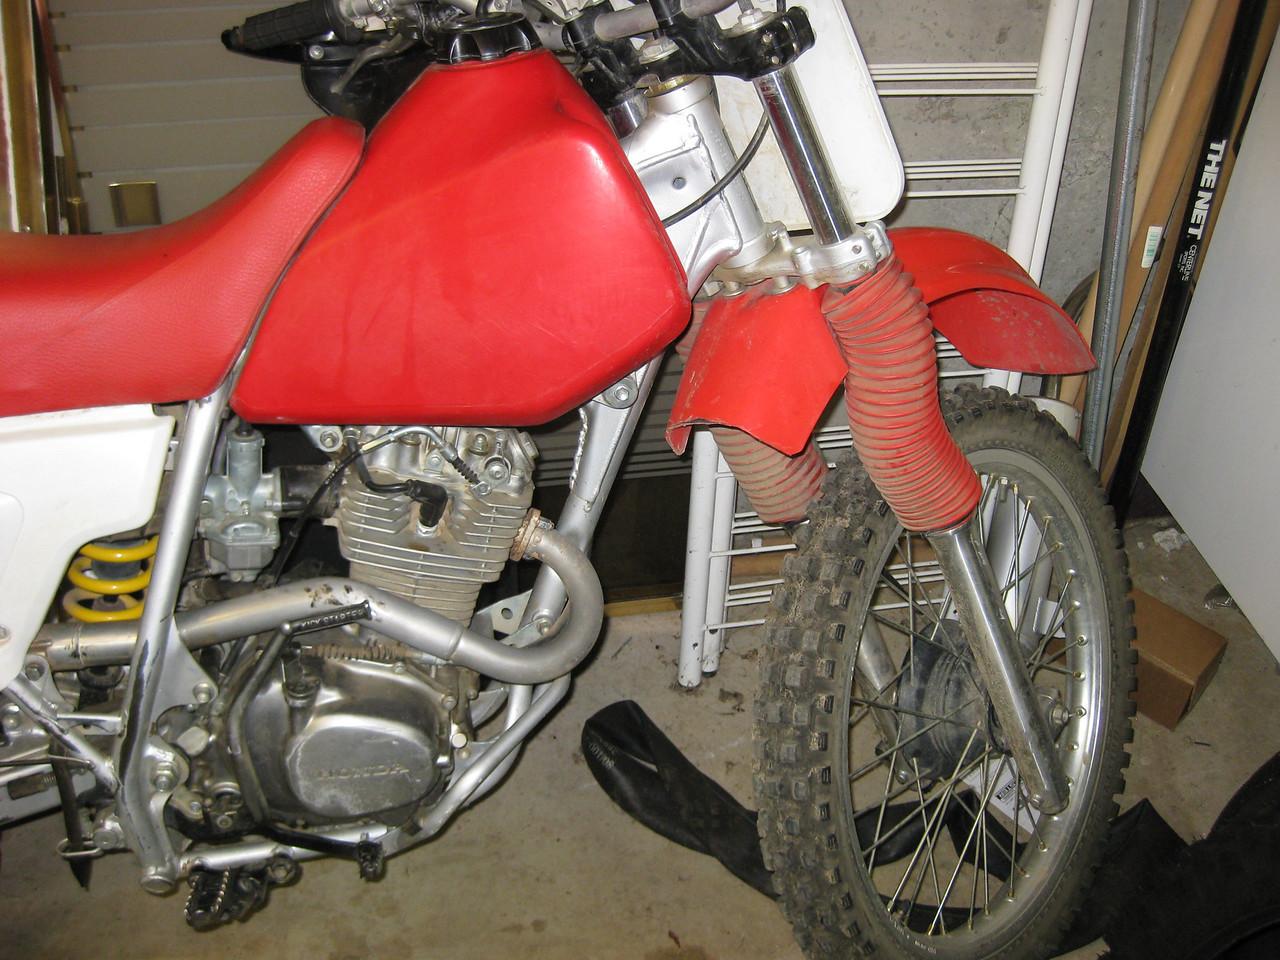 2001 XR200R front half